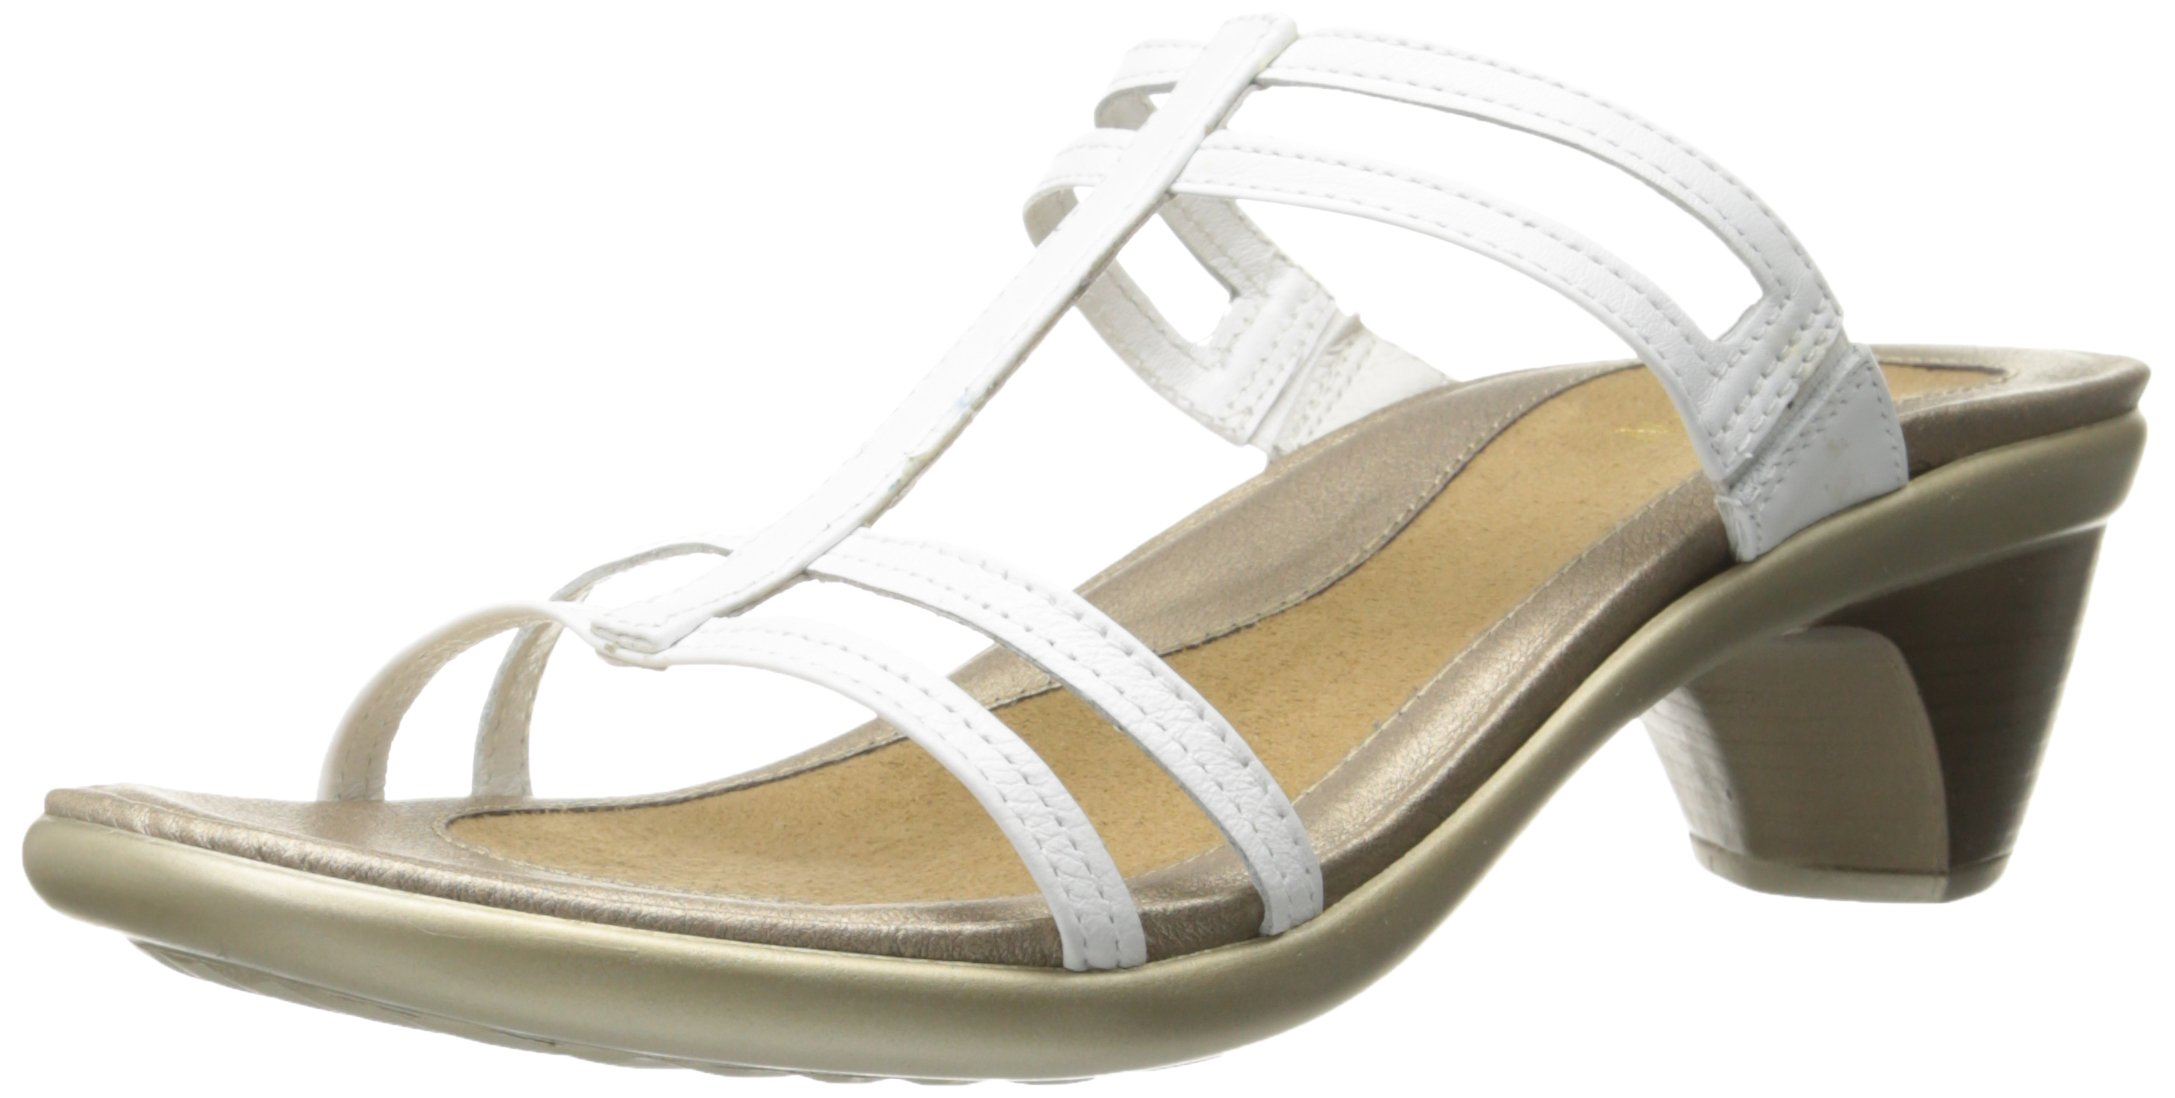 Naot Women's Loop Wedge Sandal, White Leather, 38 EU/6.5-7 M US